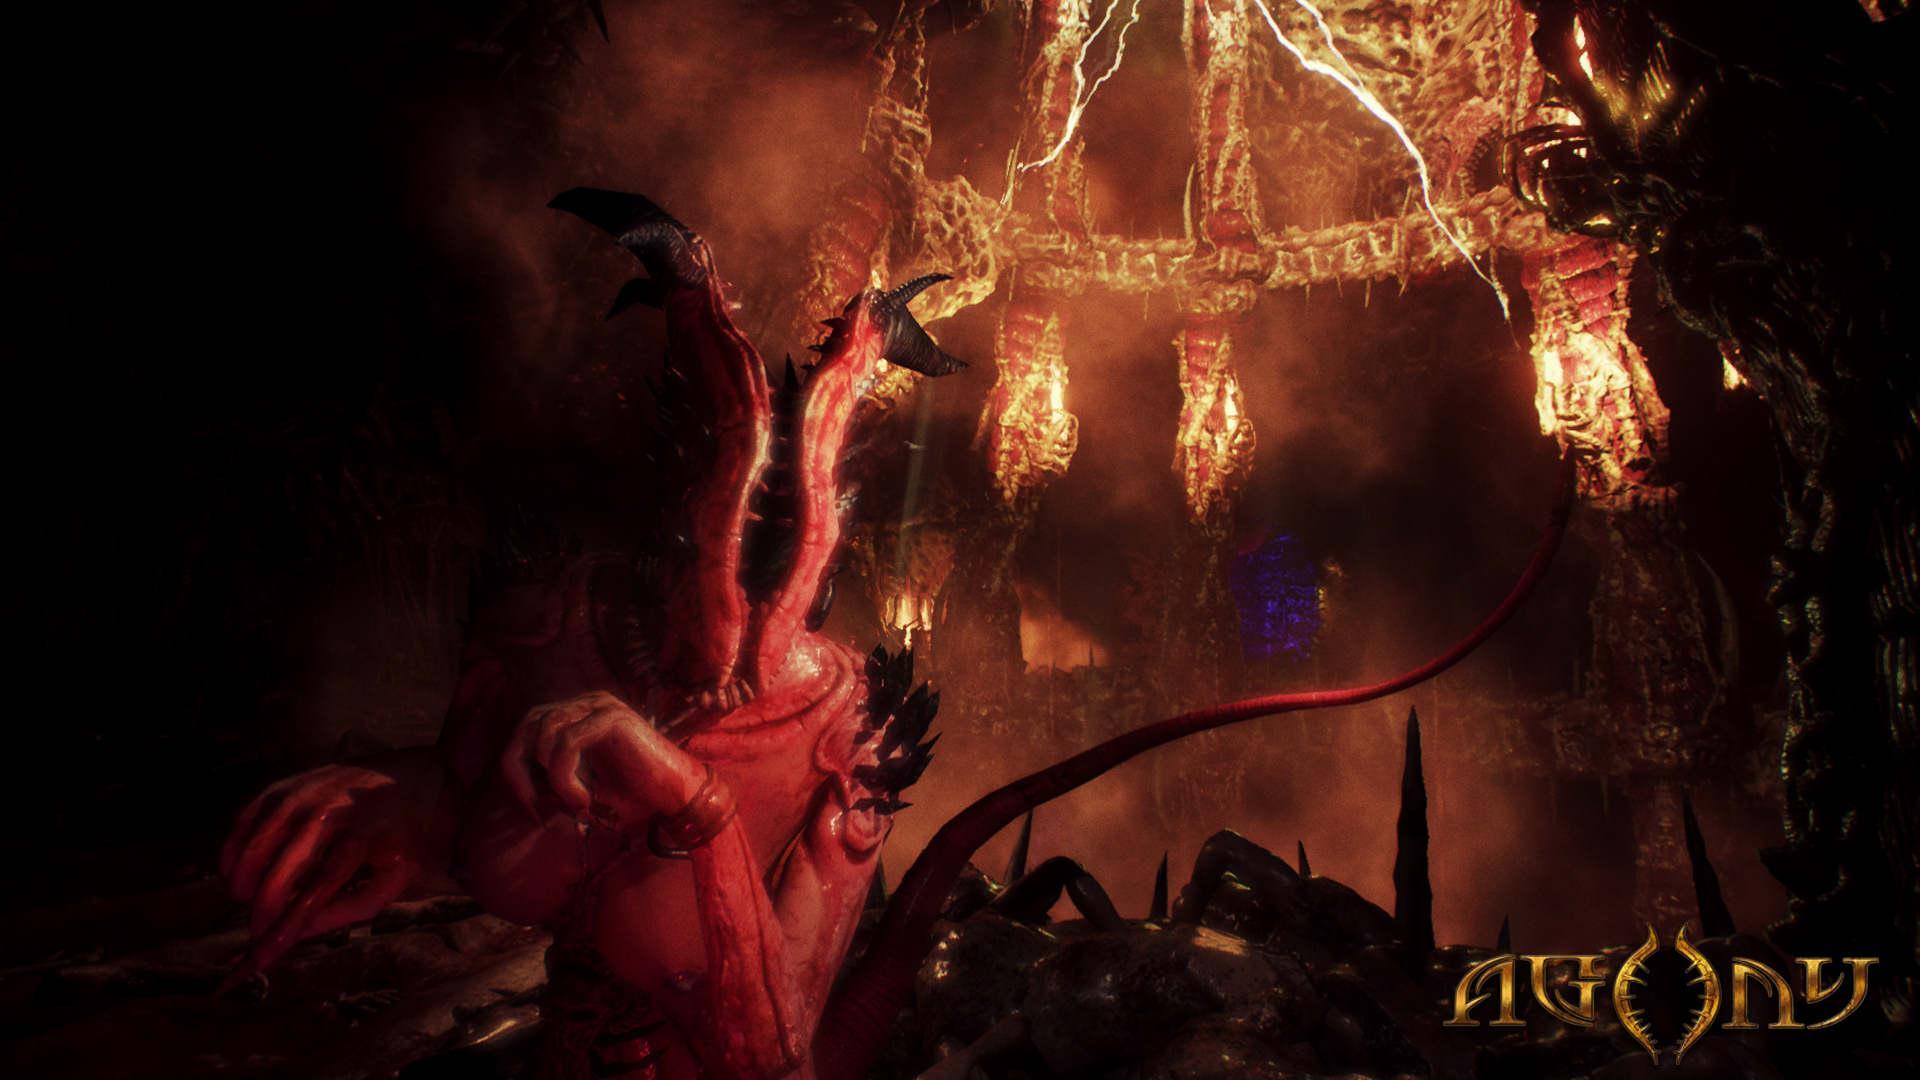 Назначена дата выхода игры Agony